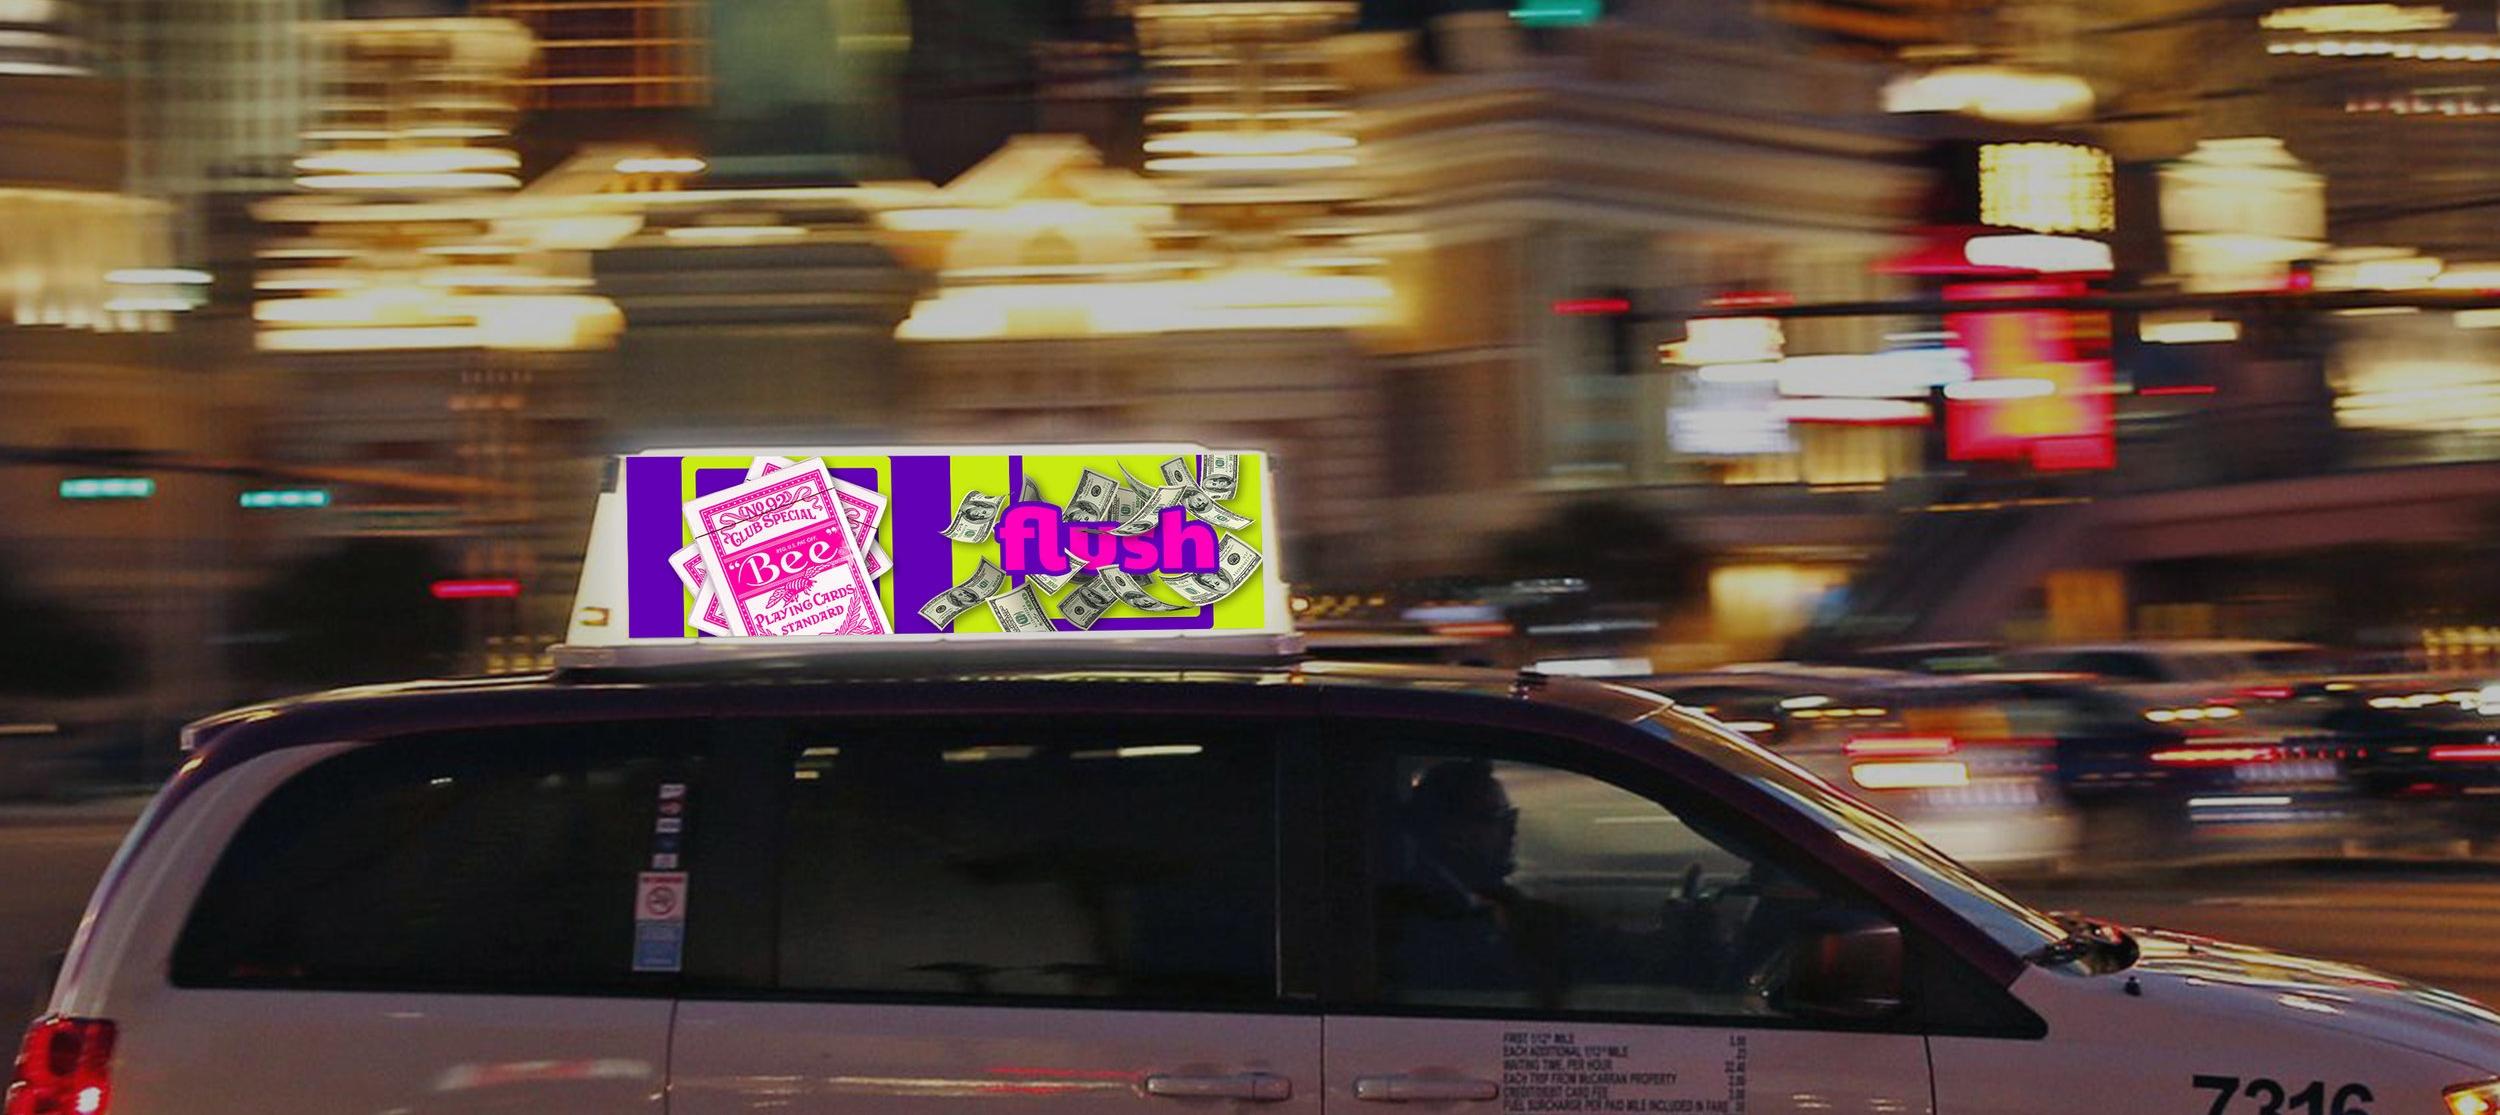 TaxiMockup.jpg